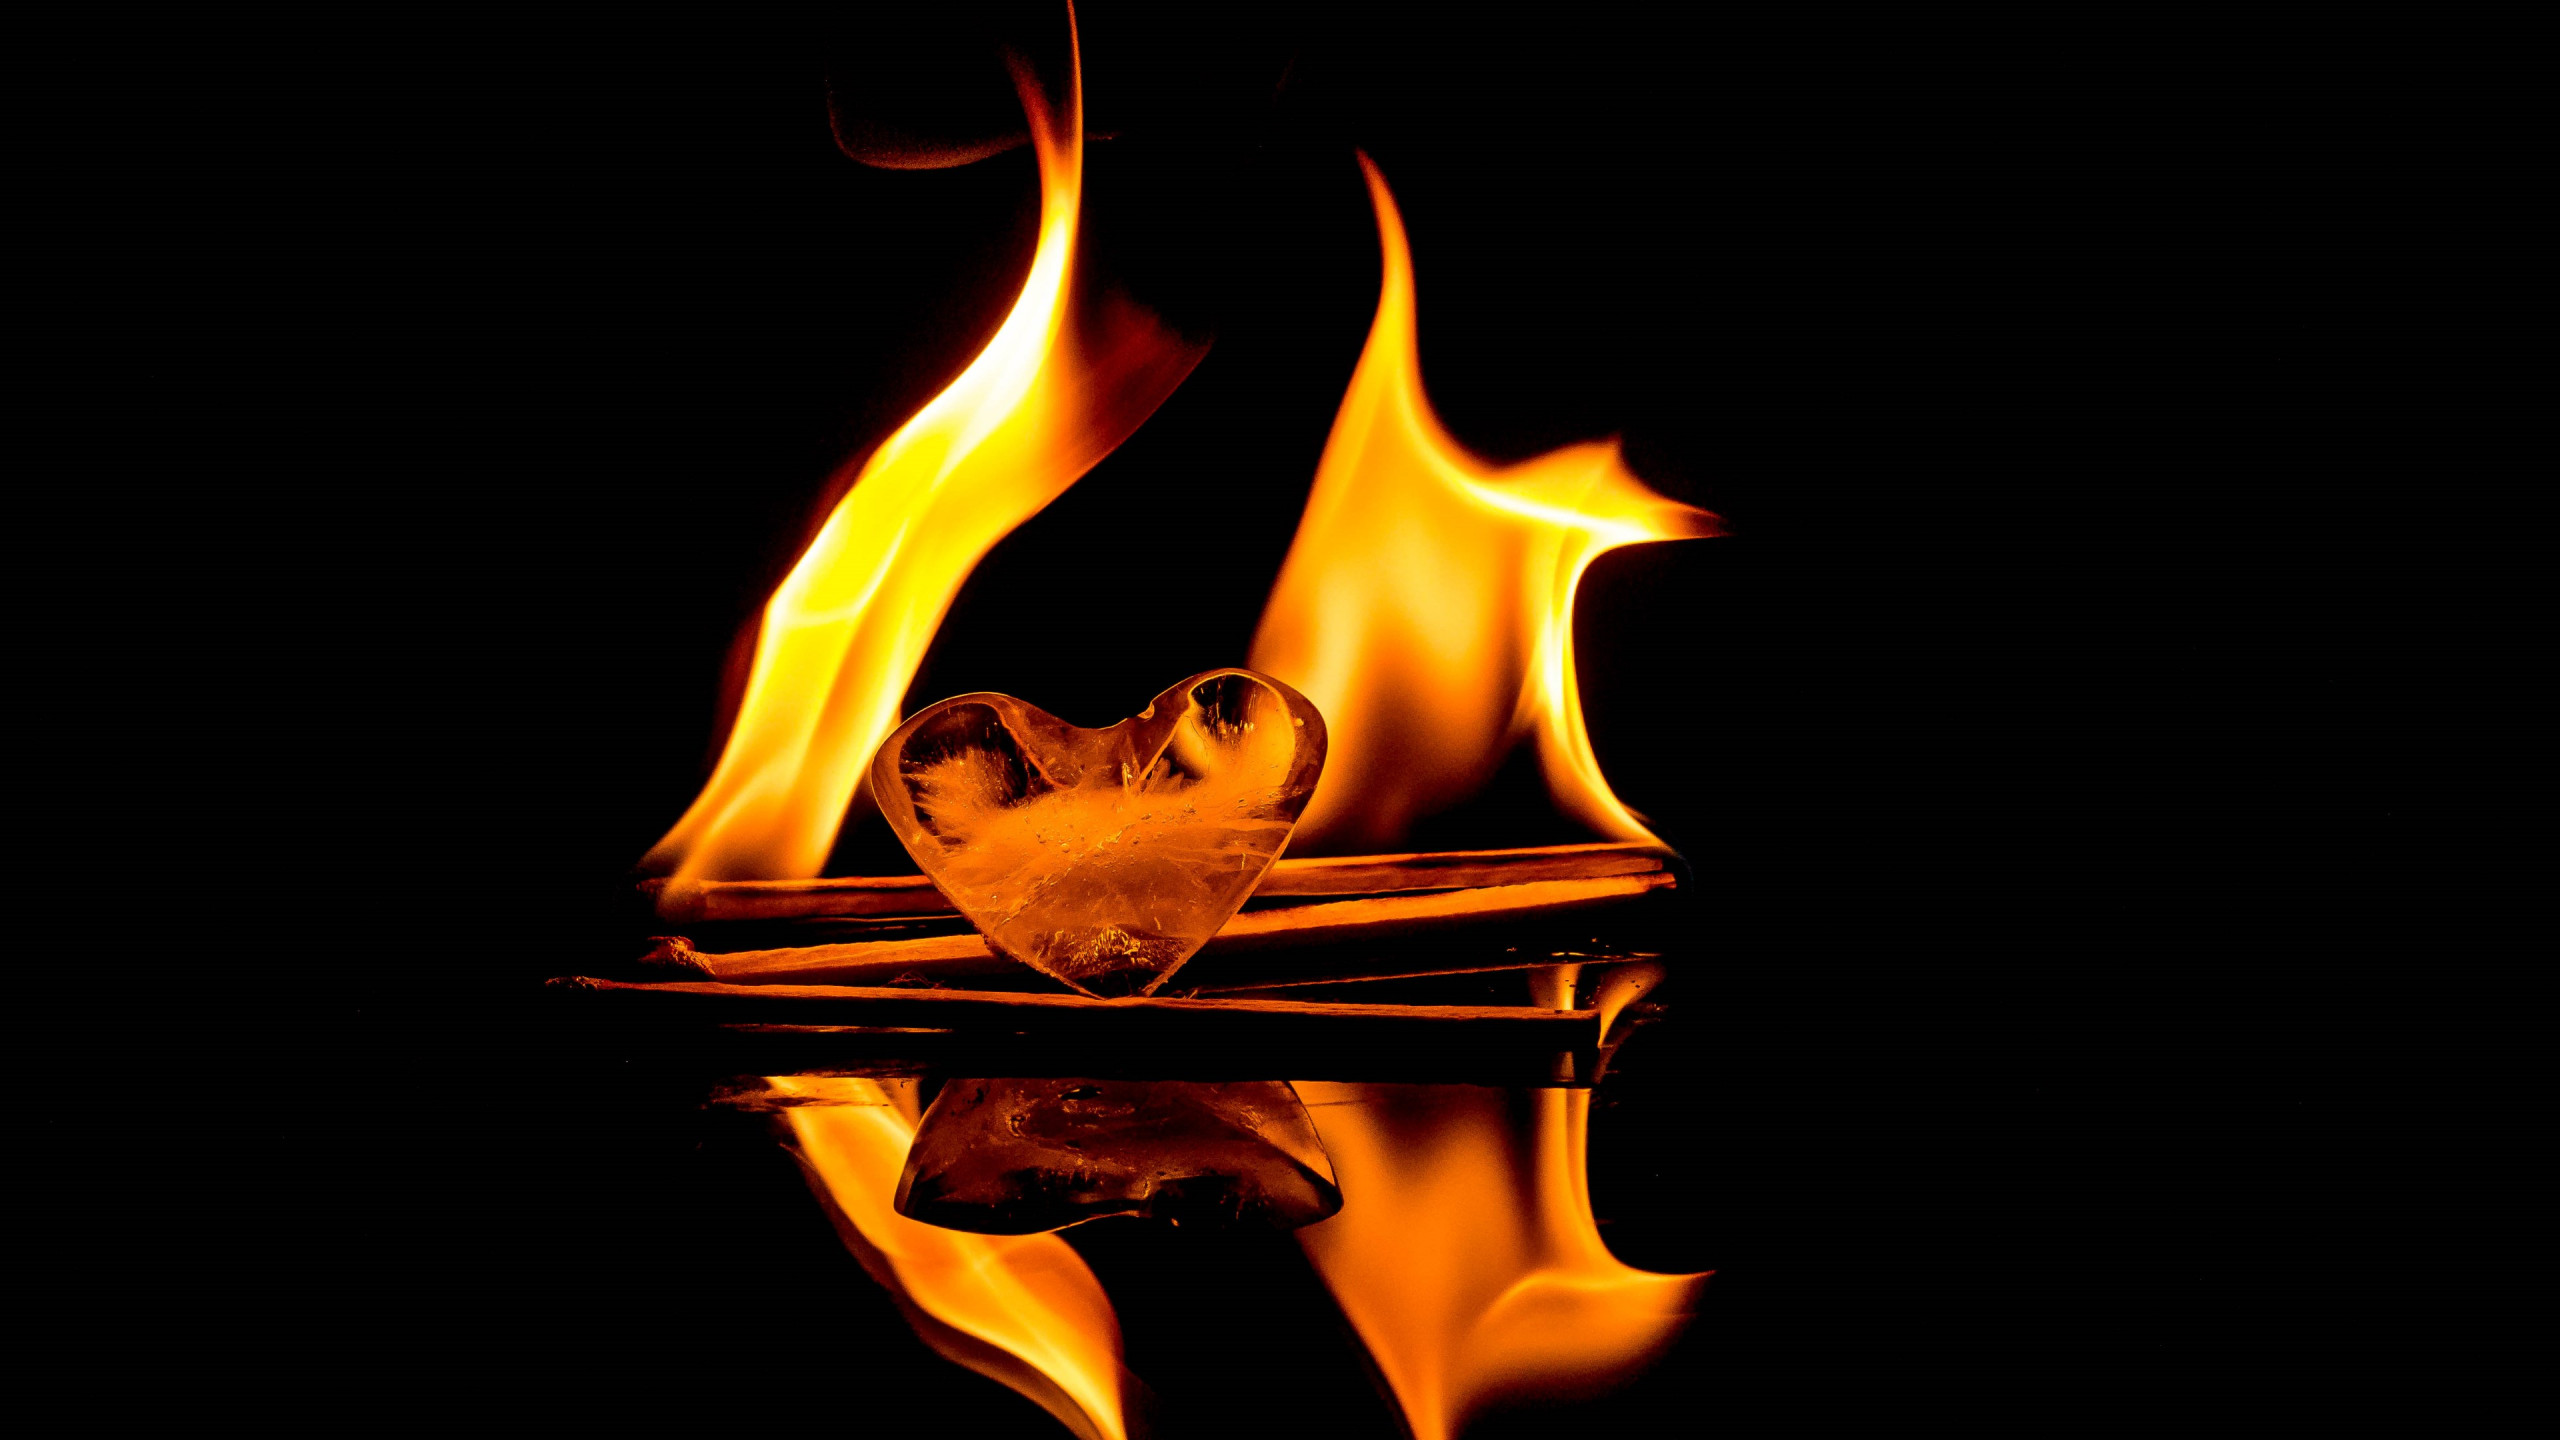 Download Wallpaper Fire Vs Ice 2560x1440